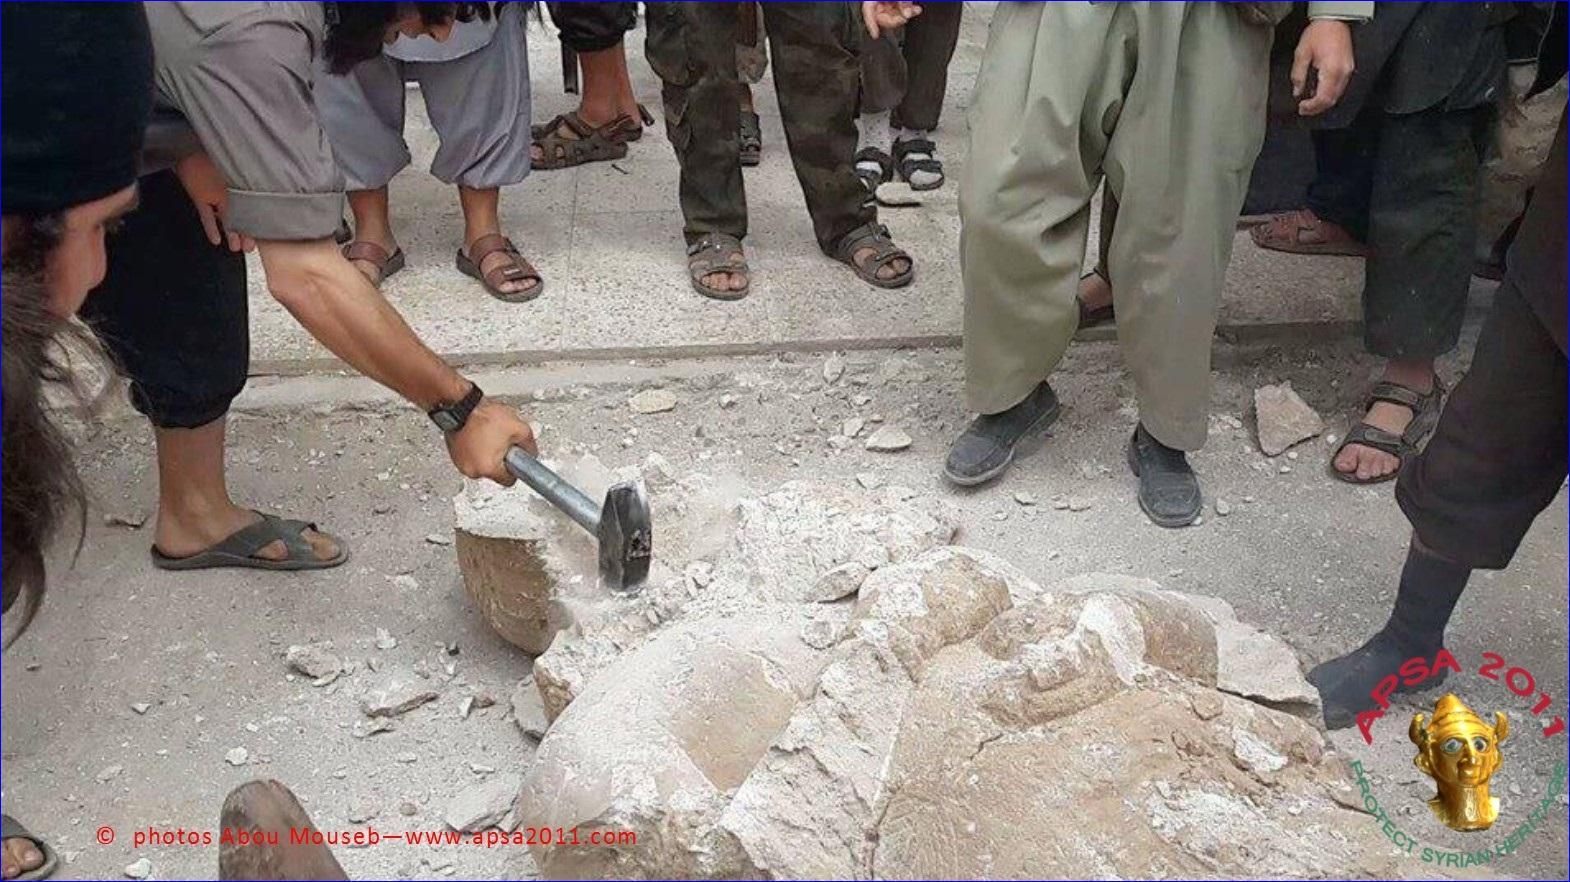 http://www.burgerbe.de/wp-content/uploads/2014/08/ISIS-zerstoerung_Statue.jpg